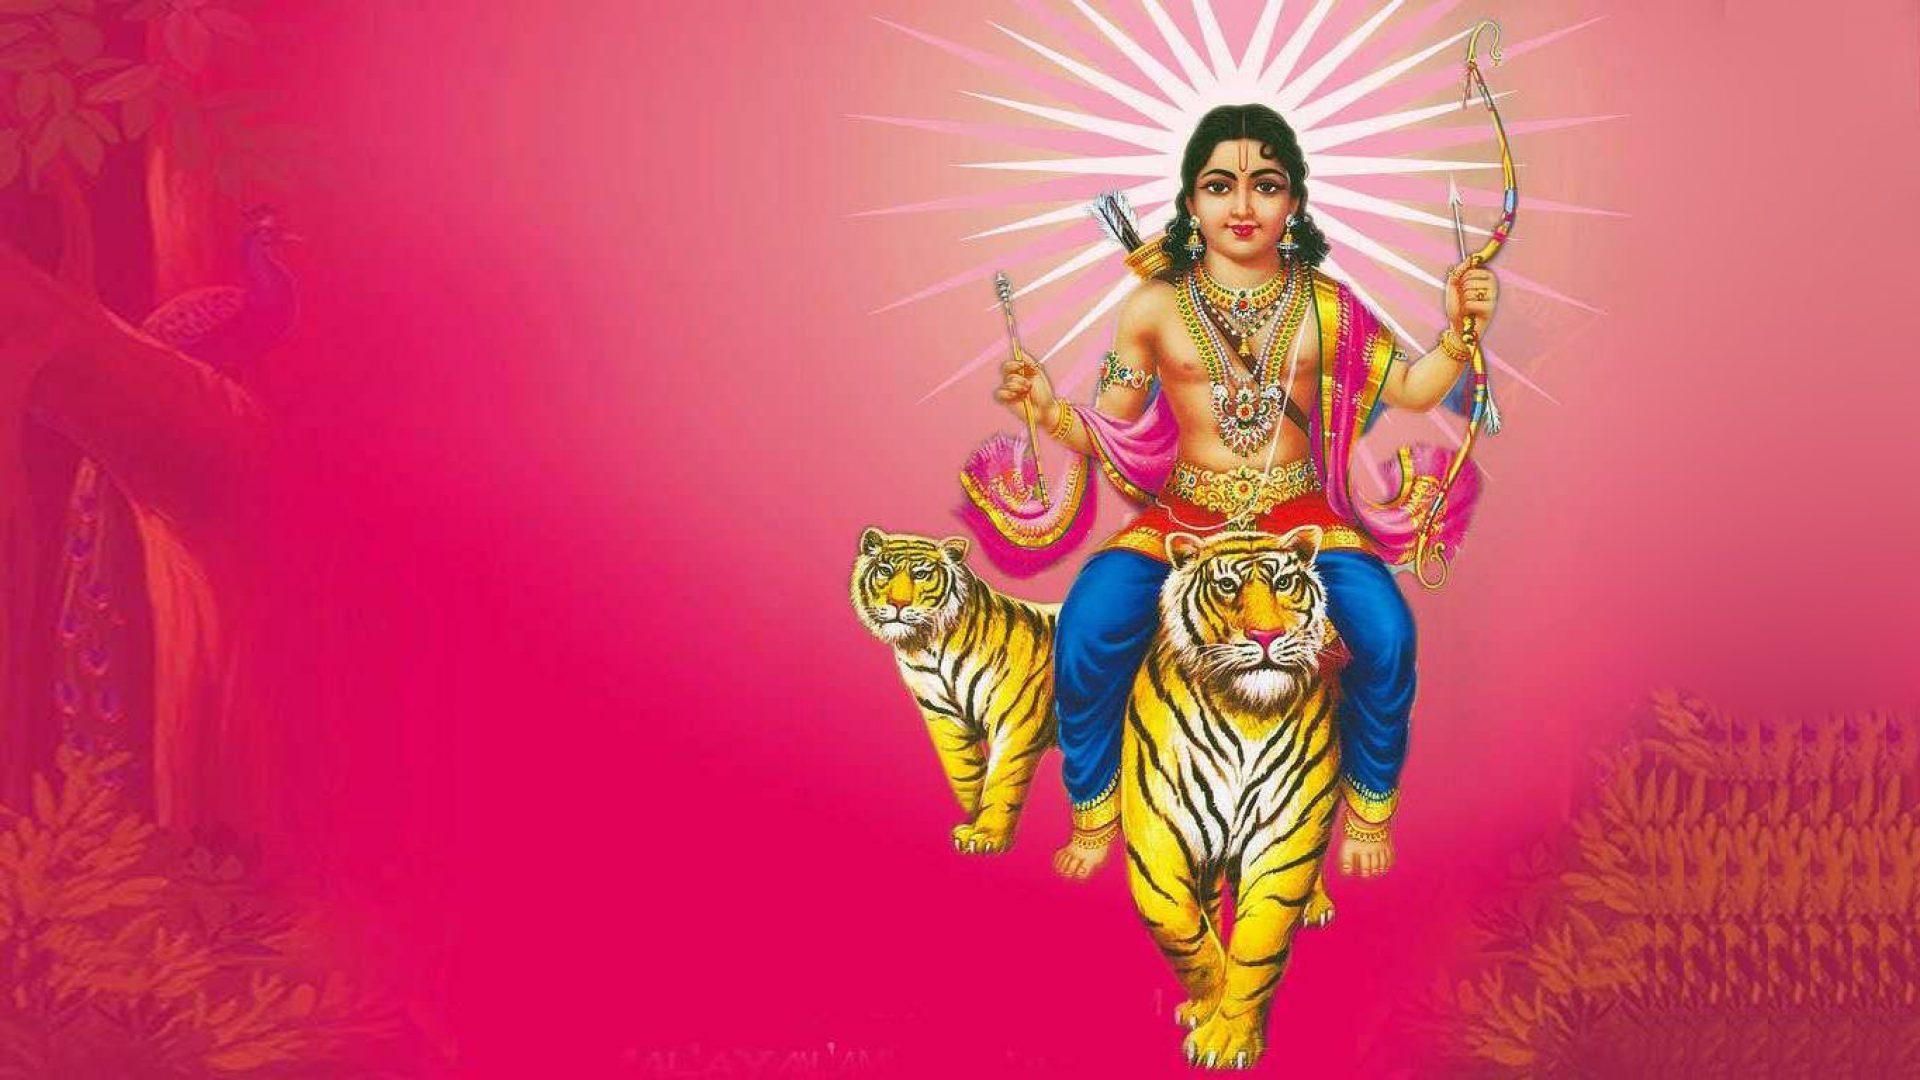 Ayyappa Swamy Hd Images Download Hindu Gods And Goddesses